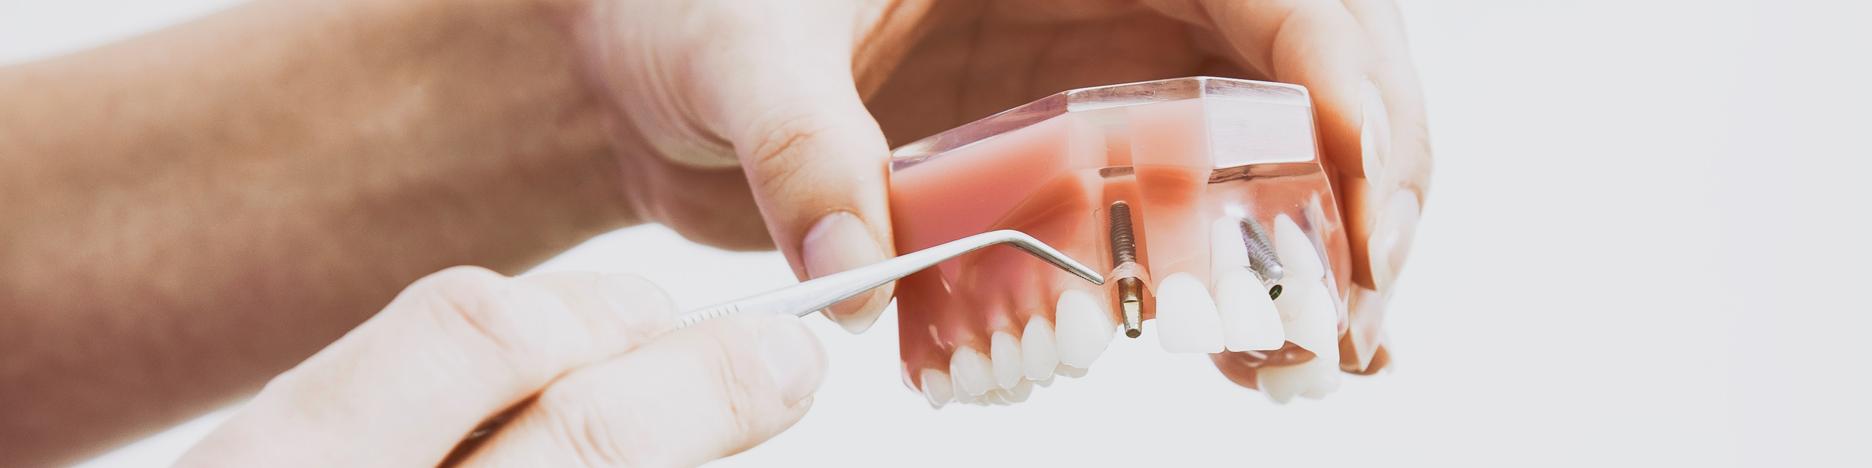 Dental Nursing Course in London